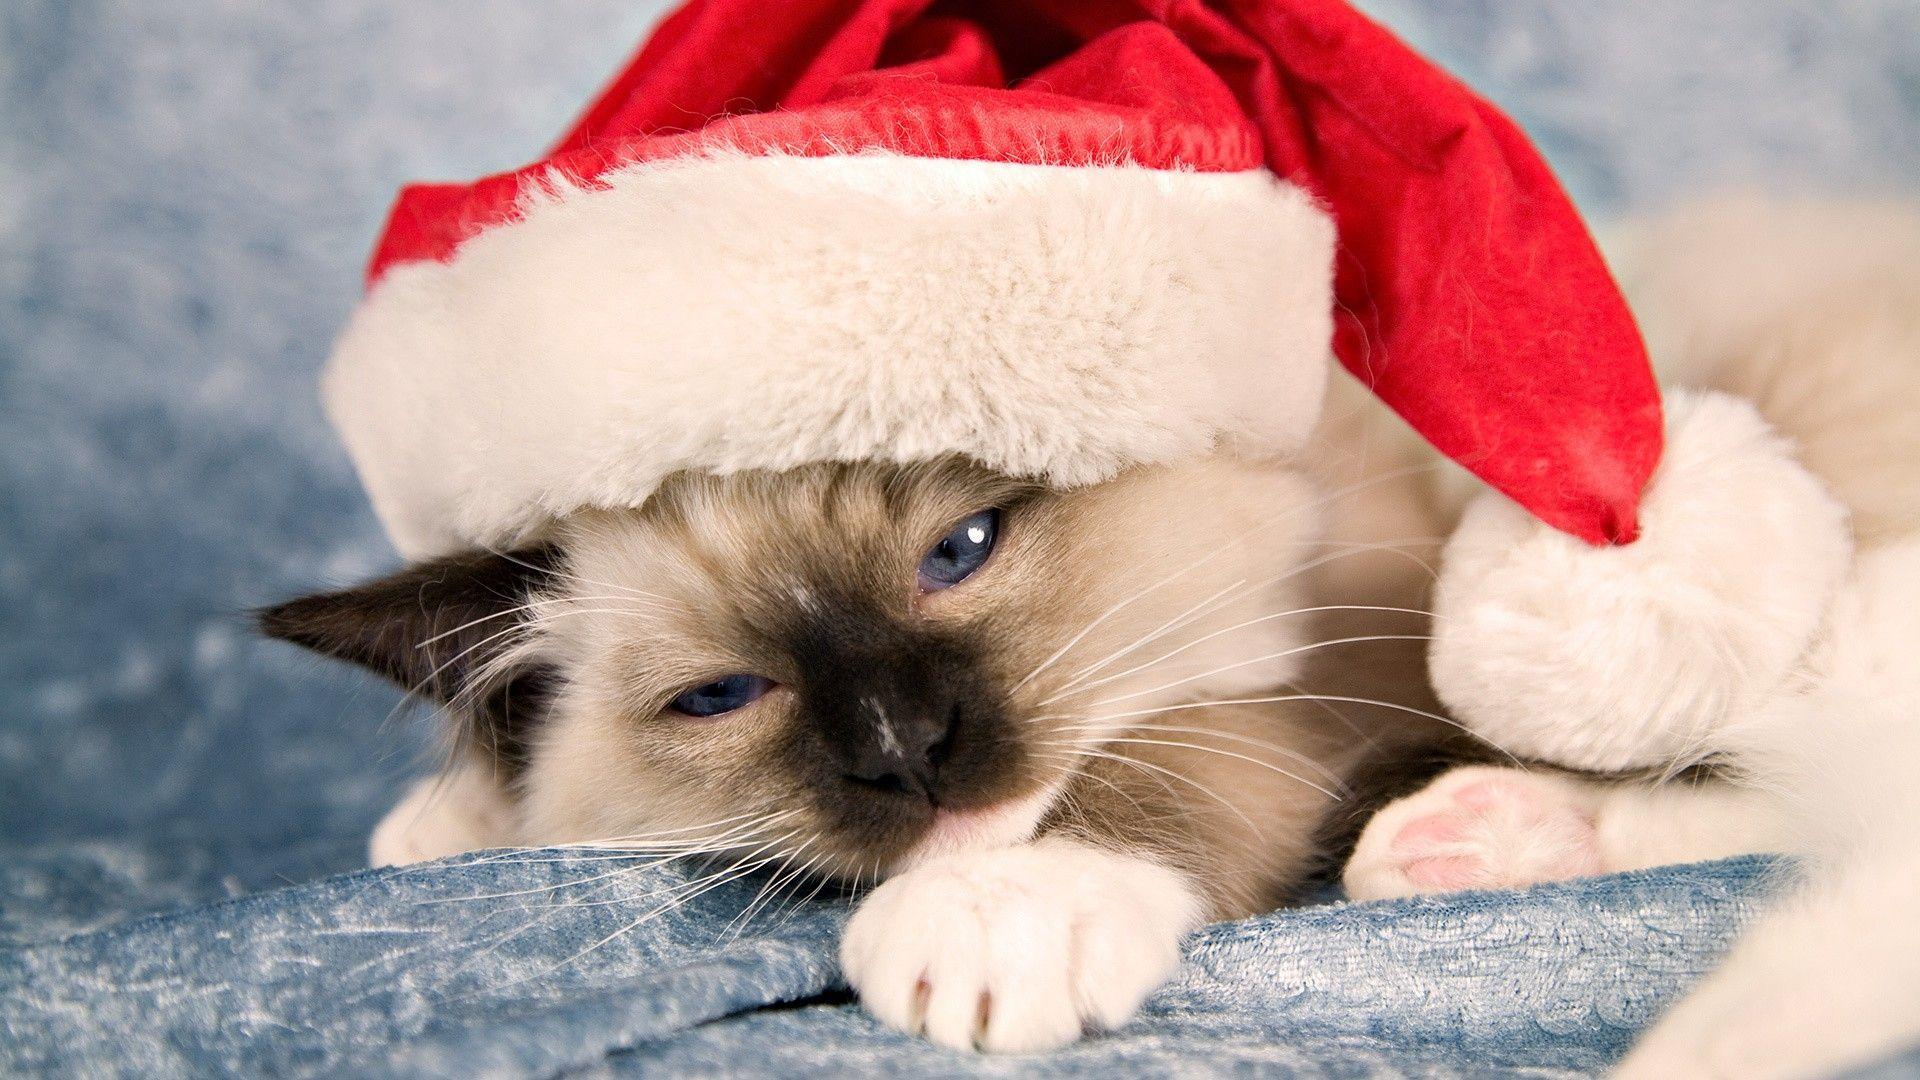 Grumpy Cat Christmas Grumpy Cat Christmas Wallpaper Desktop And Ipad Grumpy Cat Christmas Christmas Cats Funny Cat Wallpaper Grumpy Cat